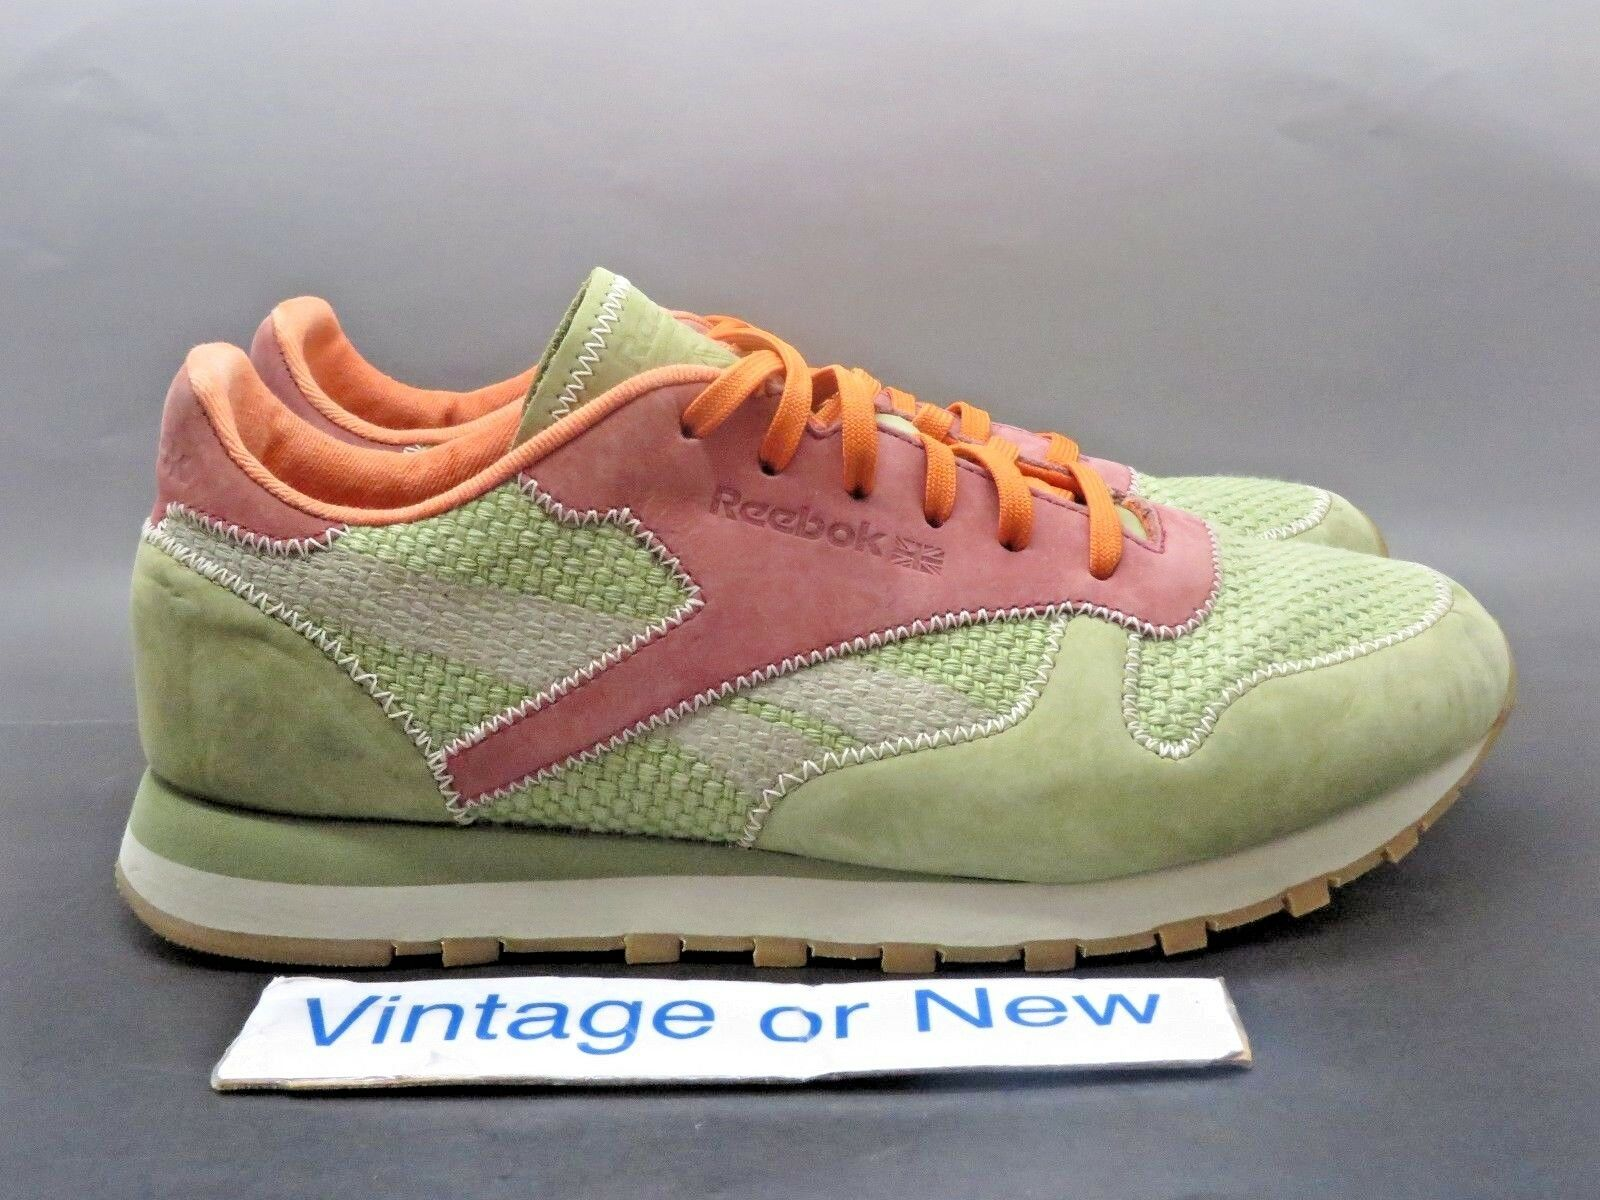 Women's Reebok Classic Hemp Light Olive Green Orange Casual Shoes sz 9.5